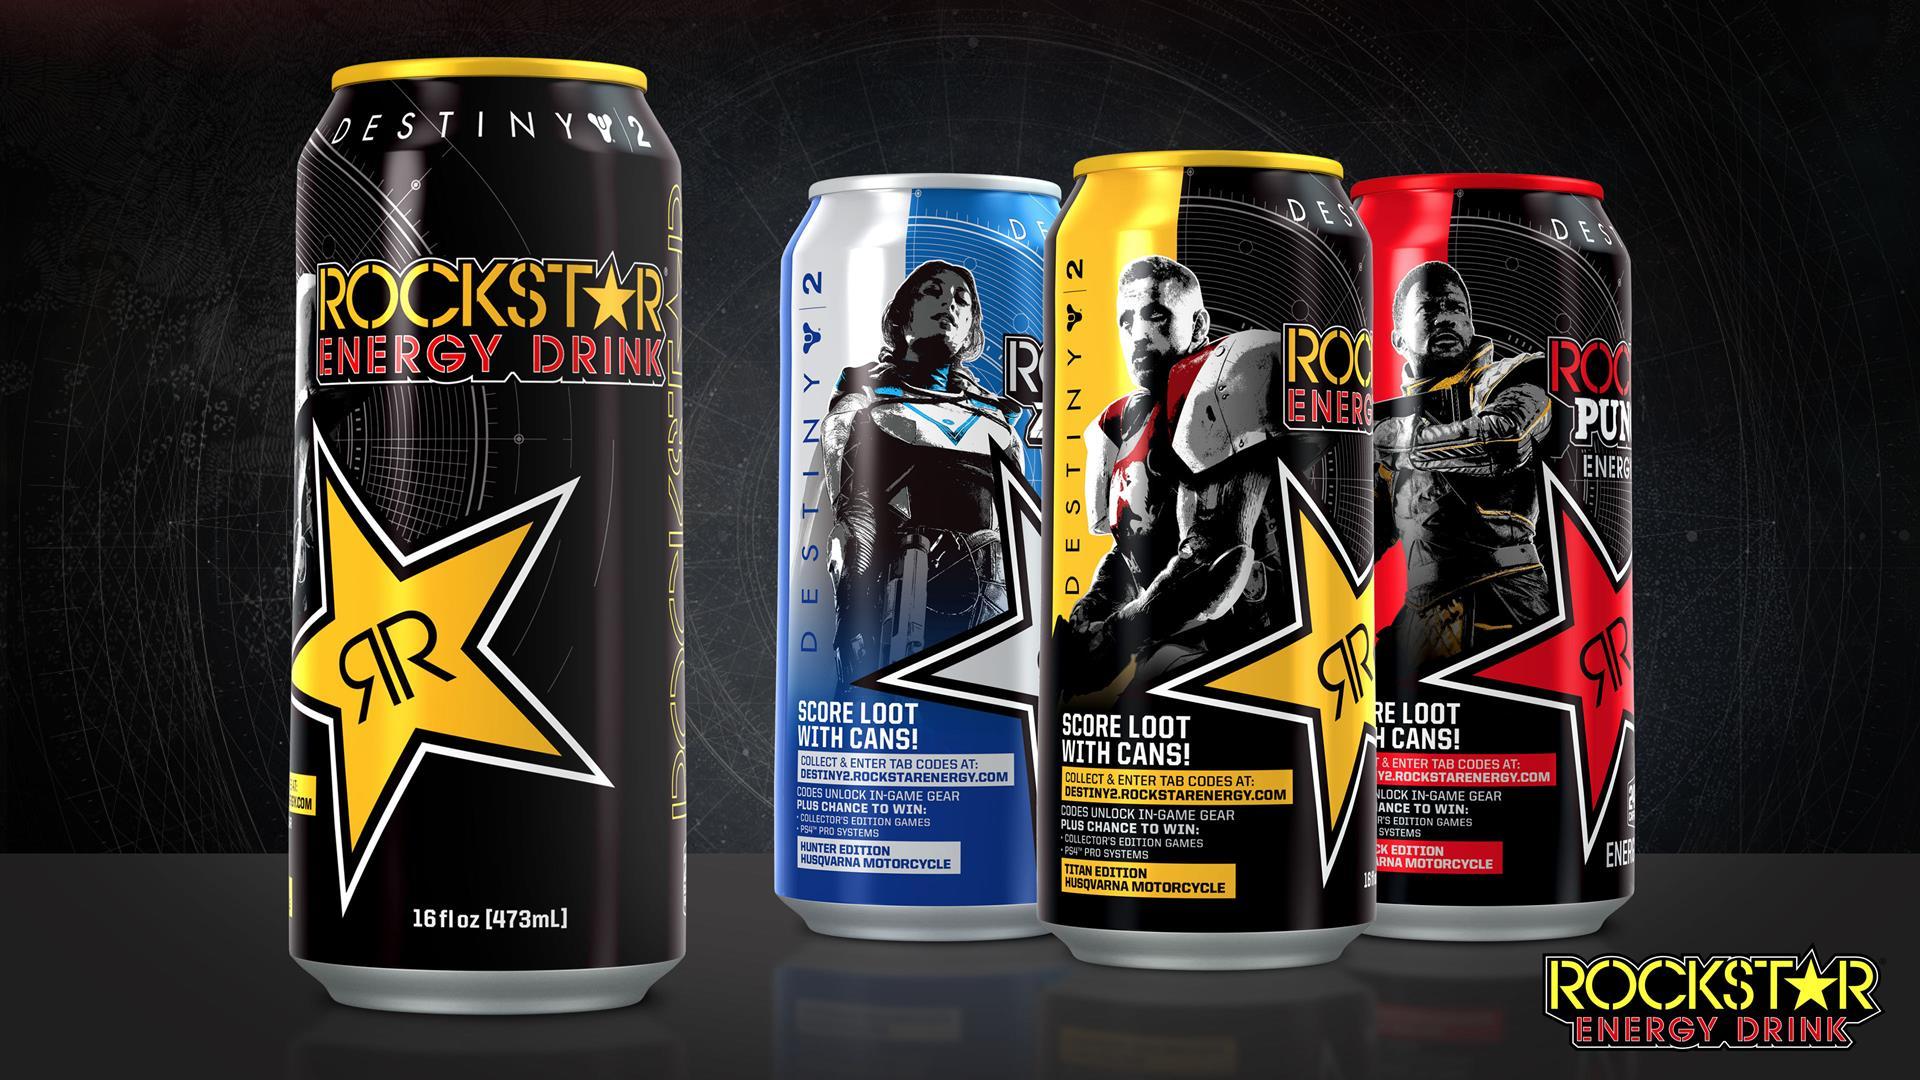 Rockstar Energy Drink Rewards